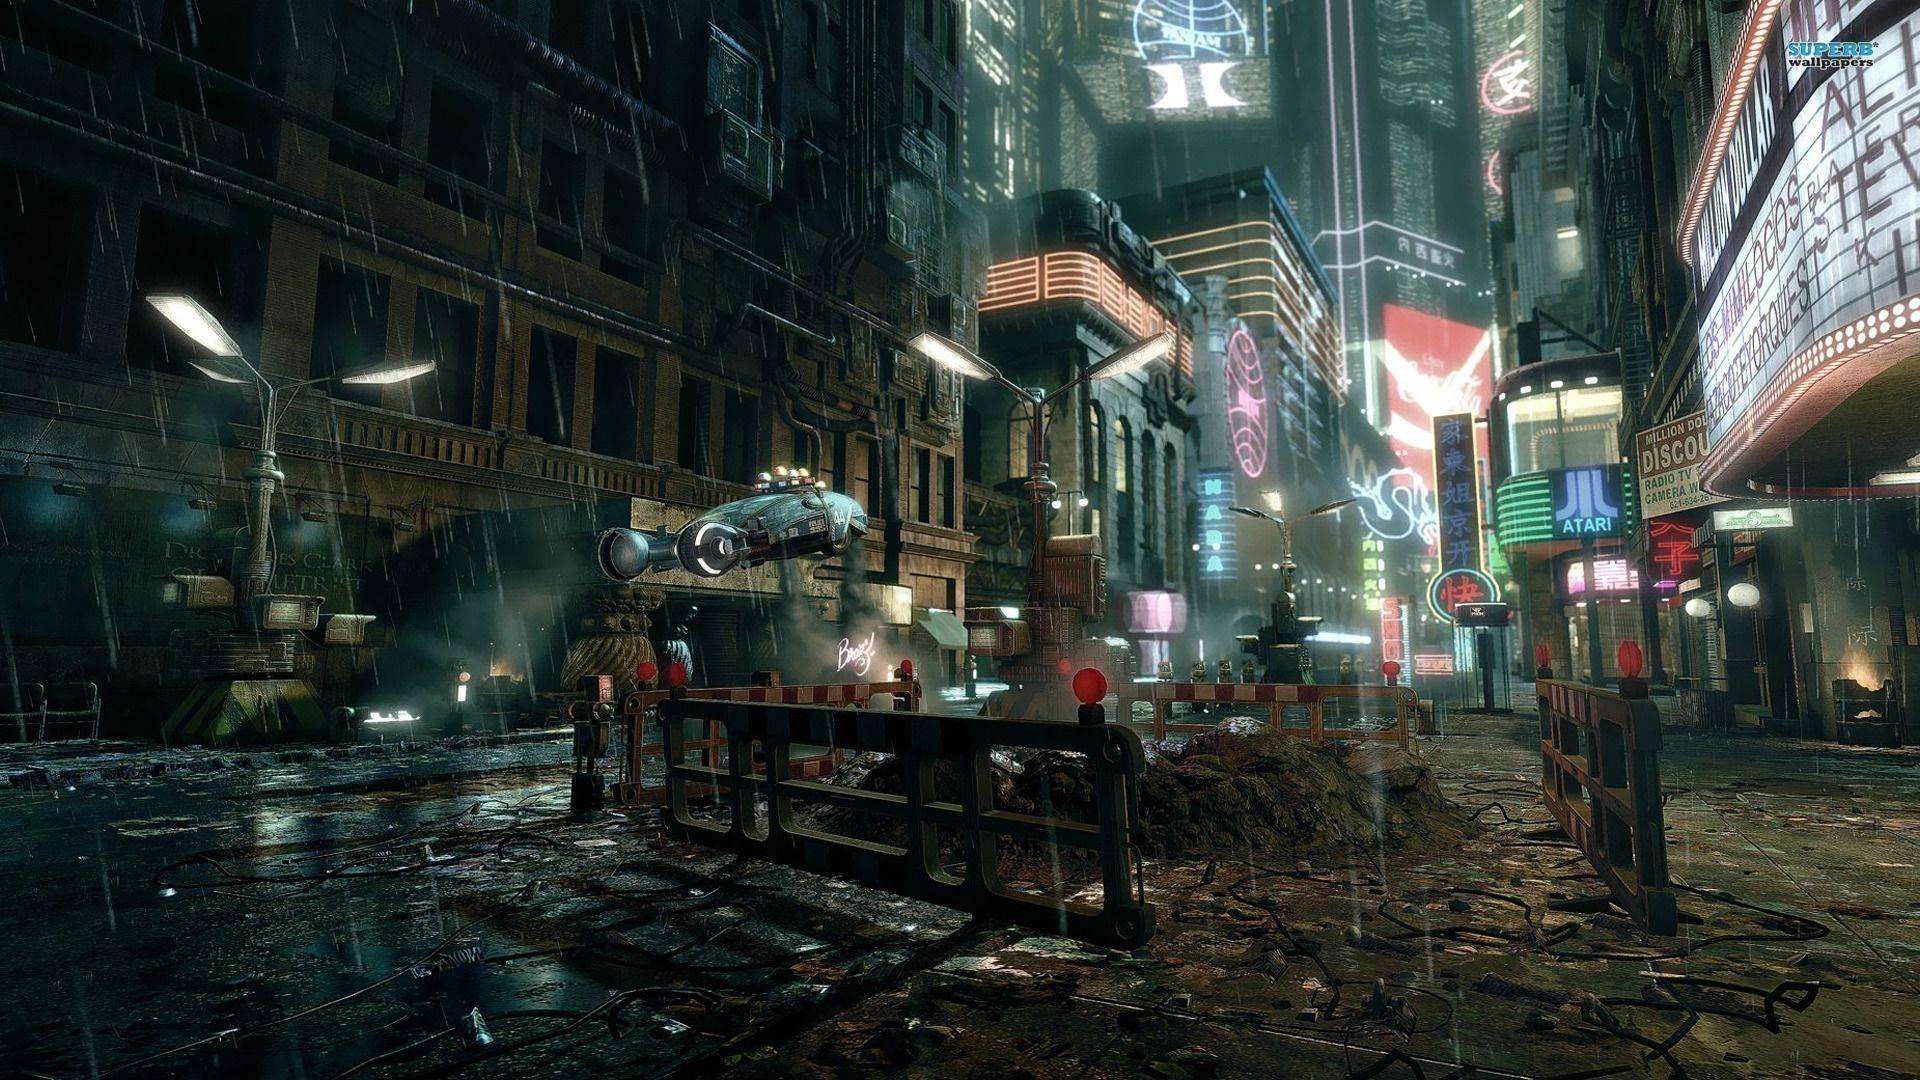 blade runner wallpaper  Blade Runner Wallpaper (71  images)